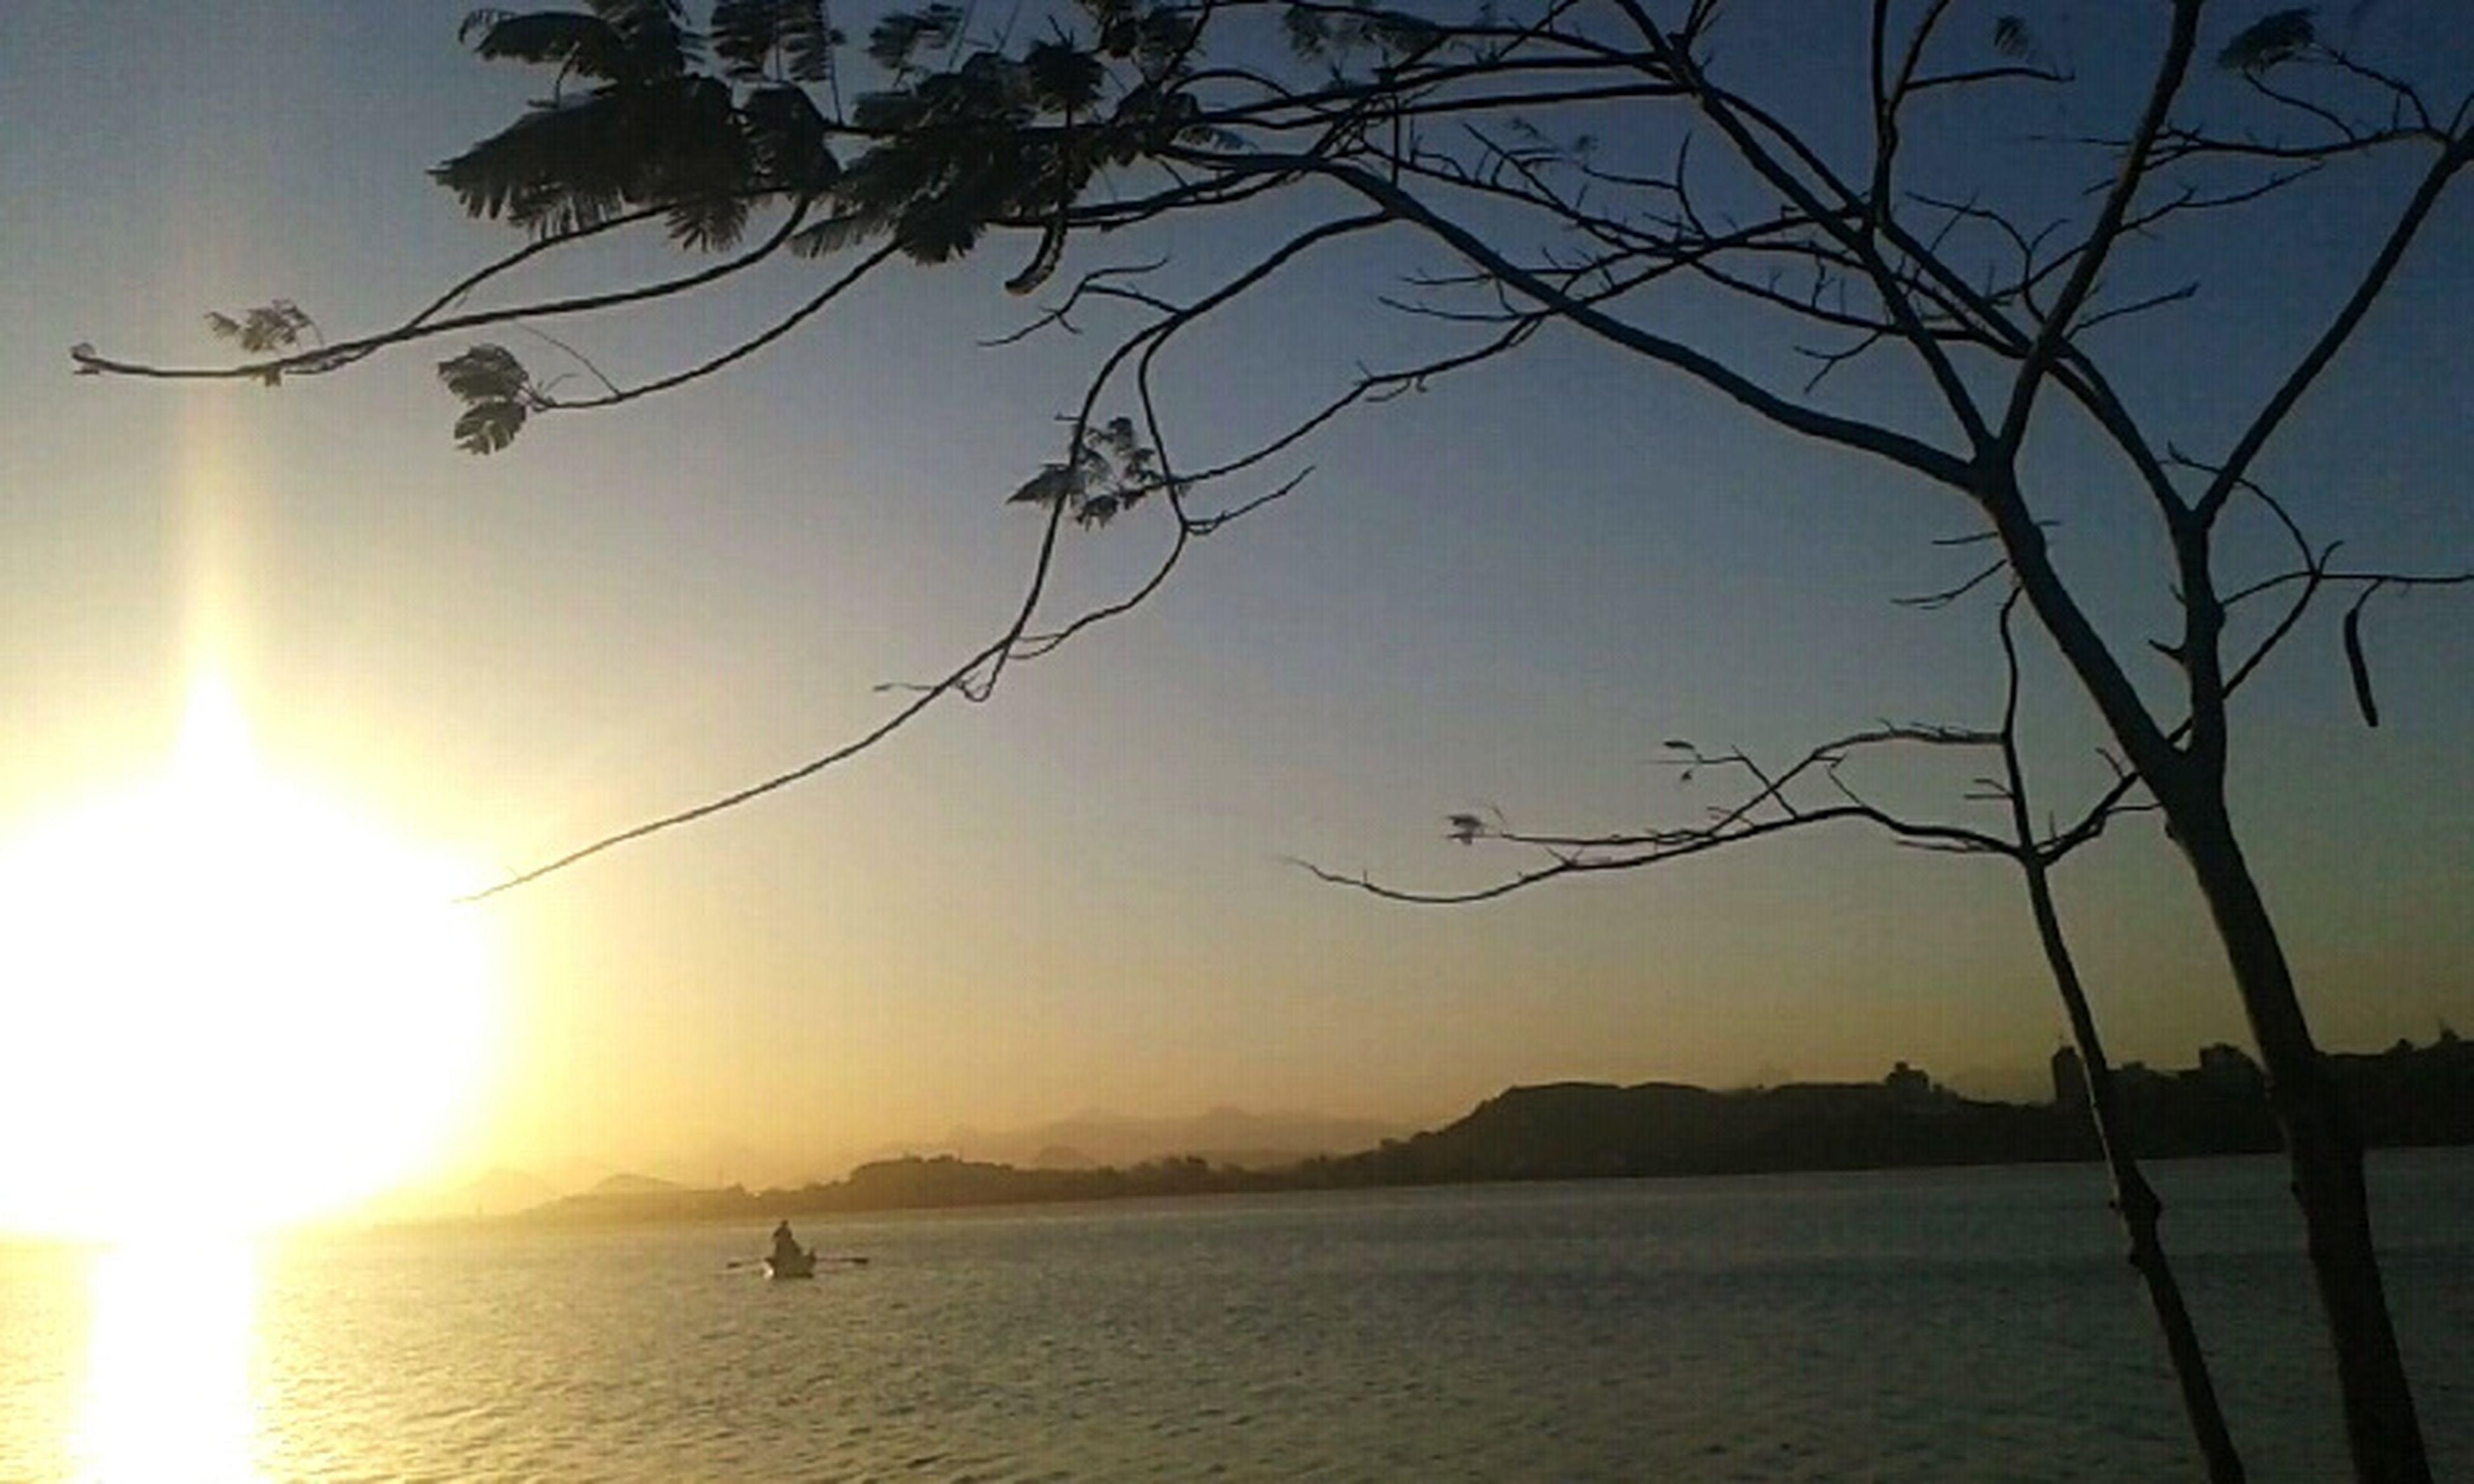 sun, water, tranquility, tranquil scene, scenics, sunset, beauty in nature, tree, branch, mountain, nature, silhouette, sunlight, bare tree, lake, sunbeam, sky, sea, idyllic, lens flare